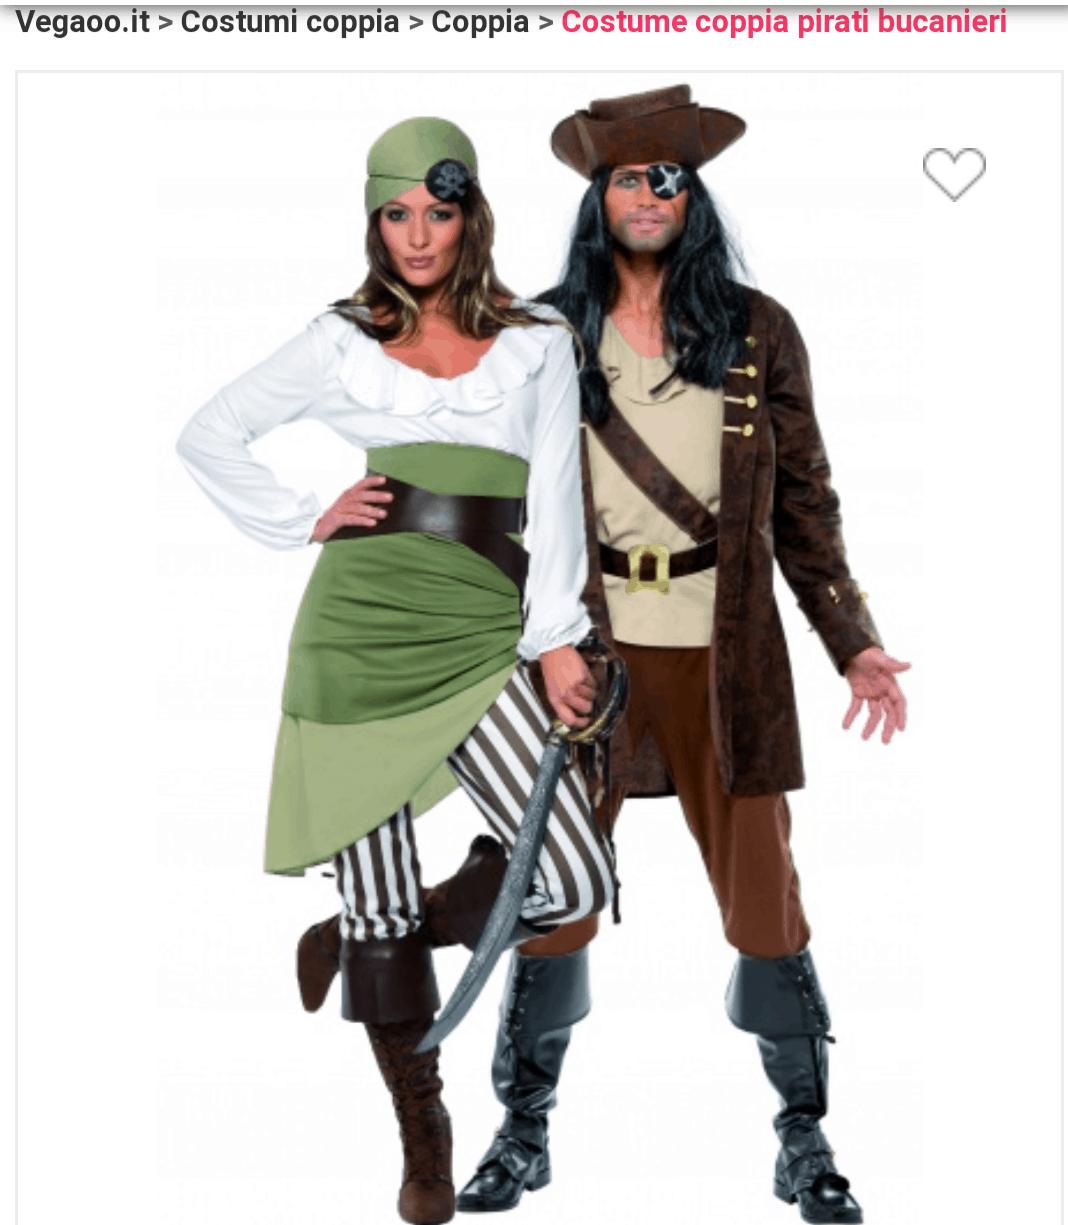 Costumi Halloween Di Gruppo.Maschere Di Carnevale Per Adulti Dove Acquistarle Online